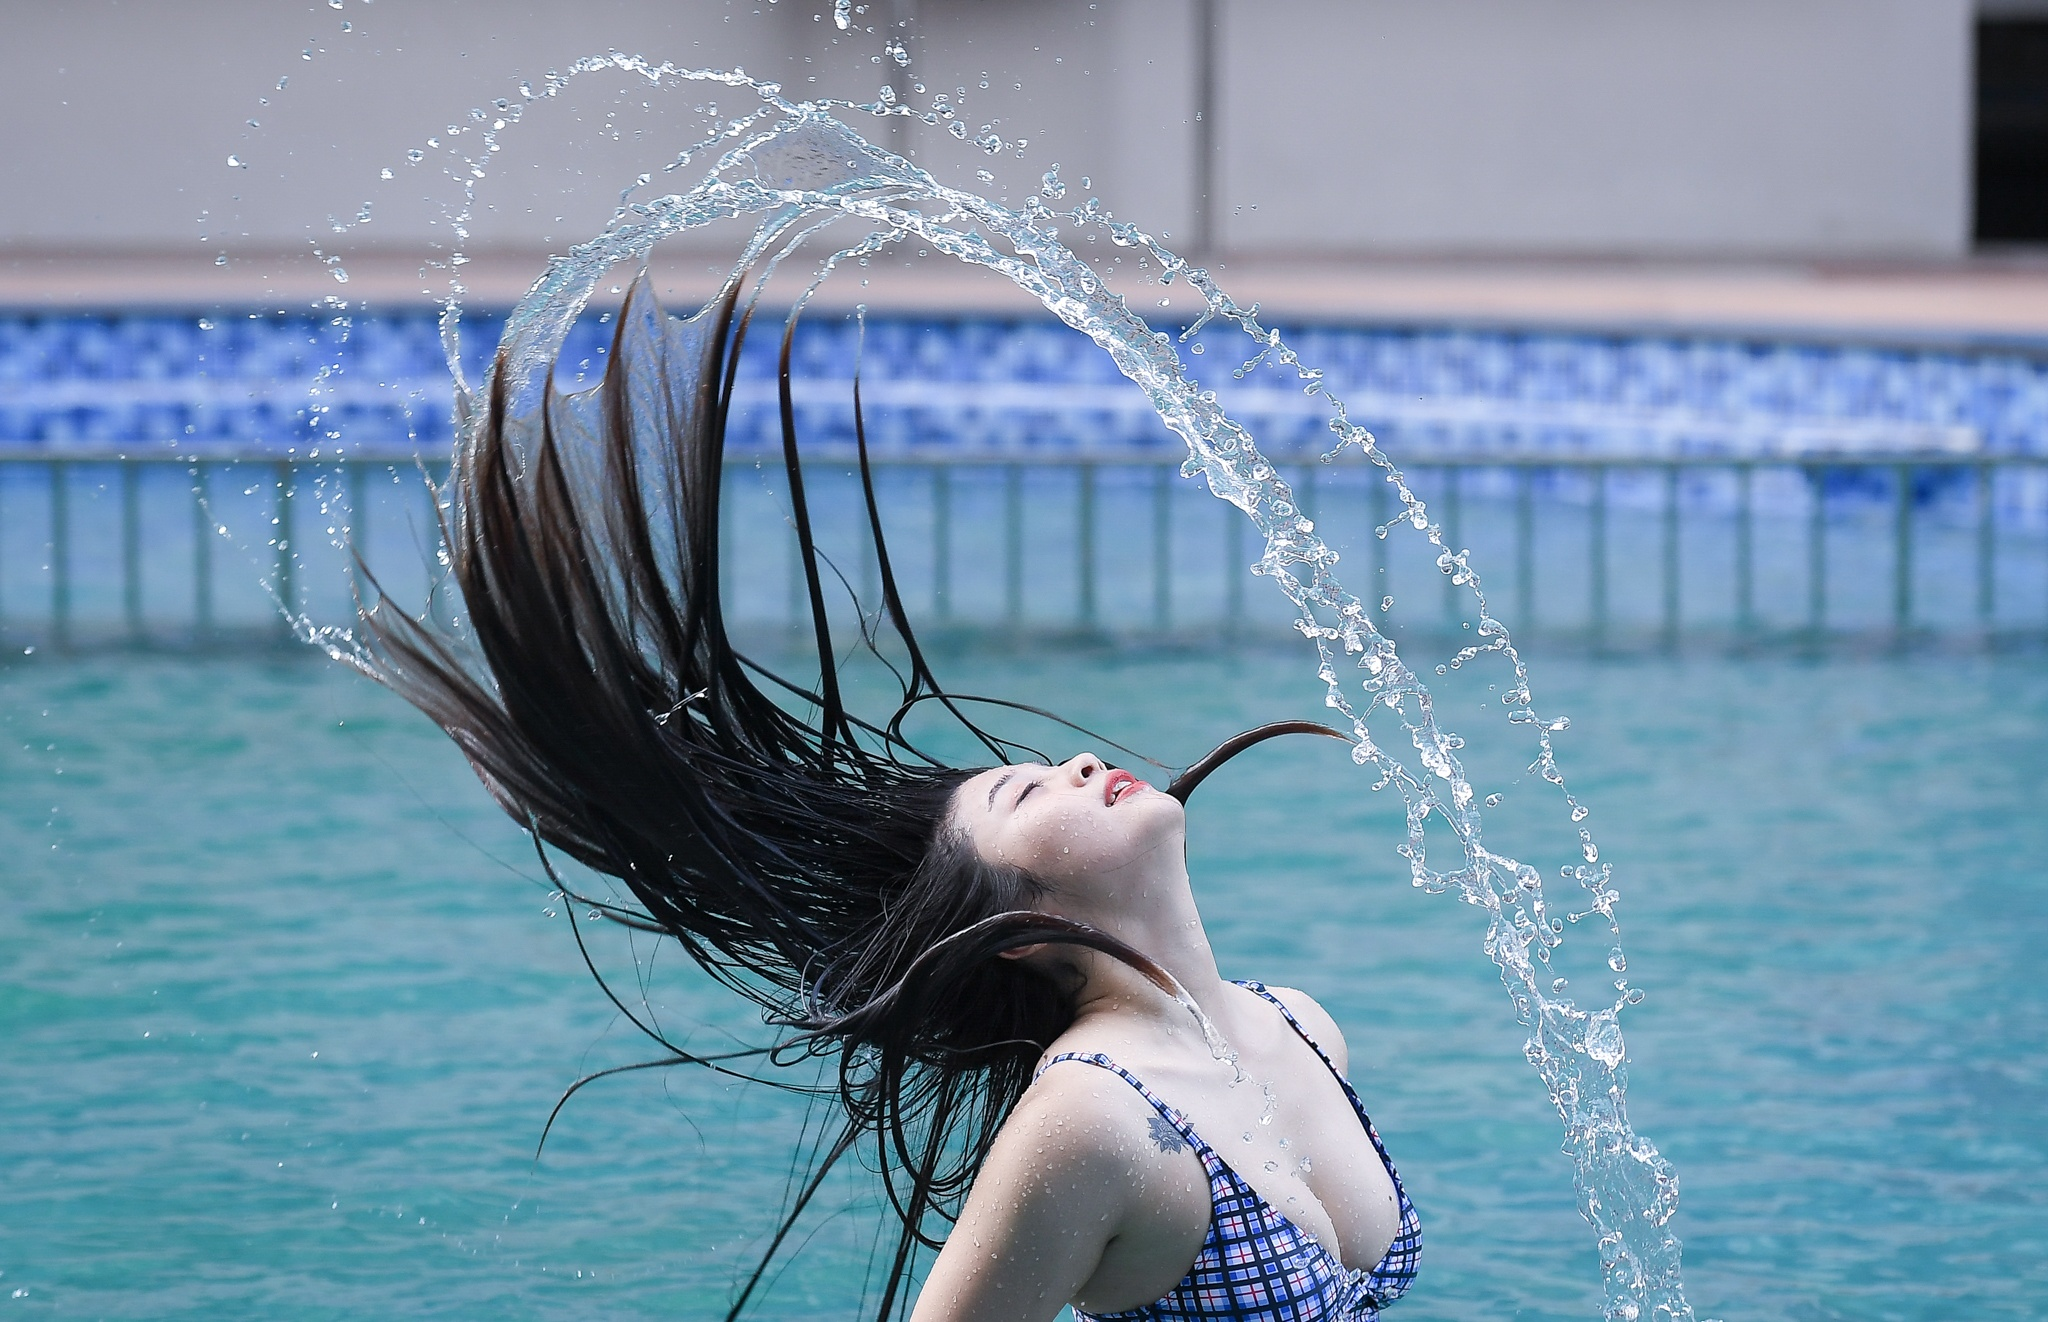 Hot girl mua con so khong ai yeu vi qua manh me hinh anh 35 37_hot_girl_mua_con_zing48.jpg